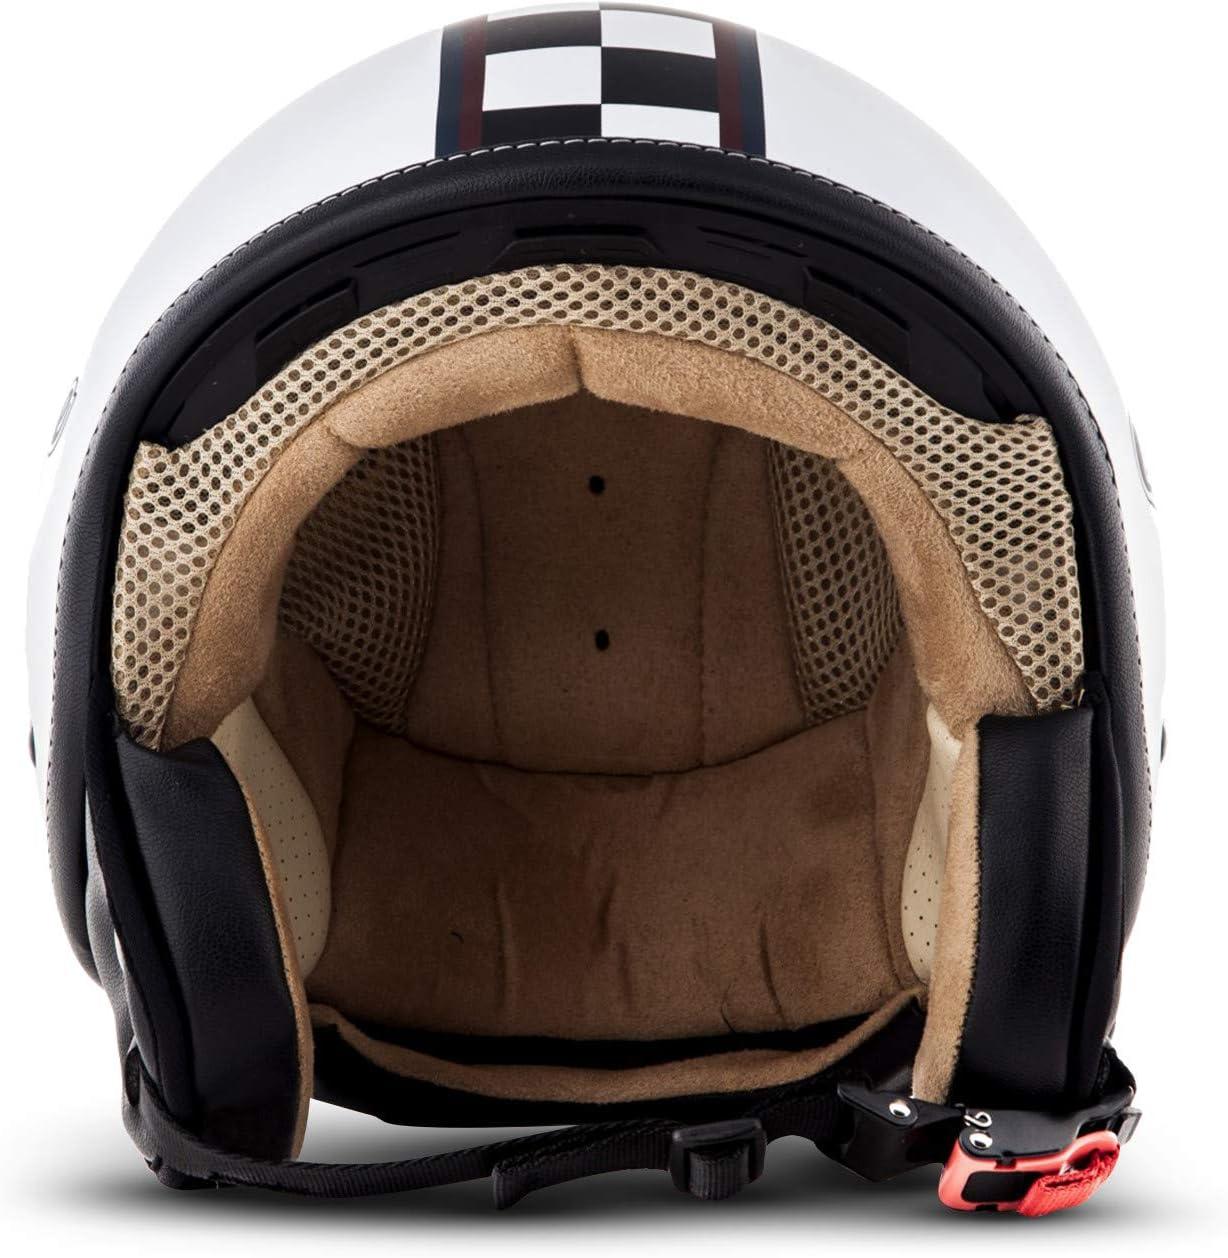 Soxon SP-301 Moto Casco Demi-Jet Compresi Sacchetto Portacasco XS Bianco//Neve 53-54cm ECE Certificato